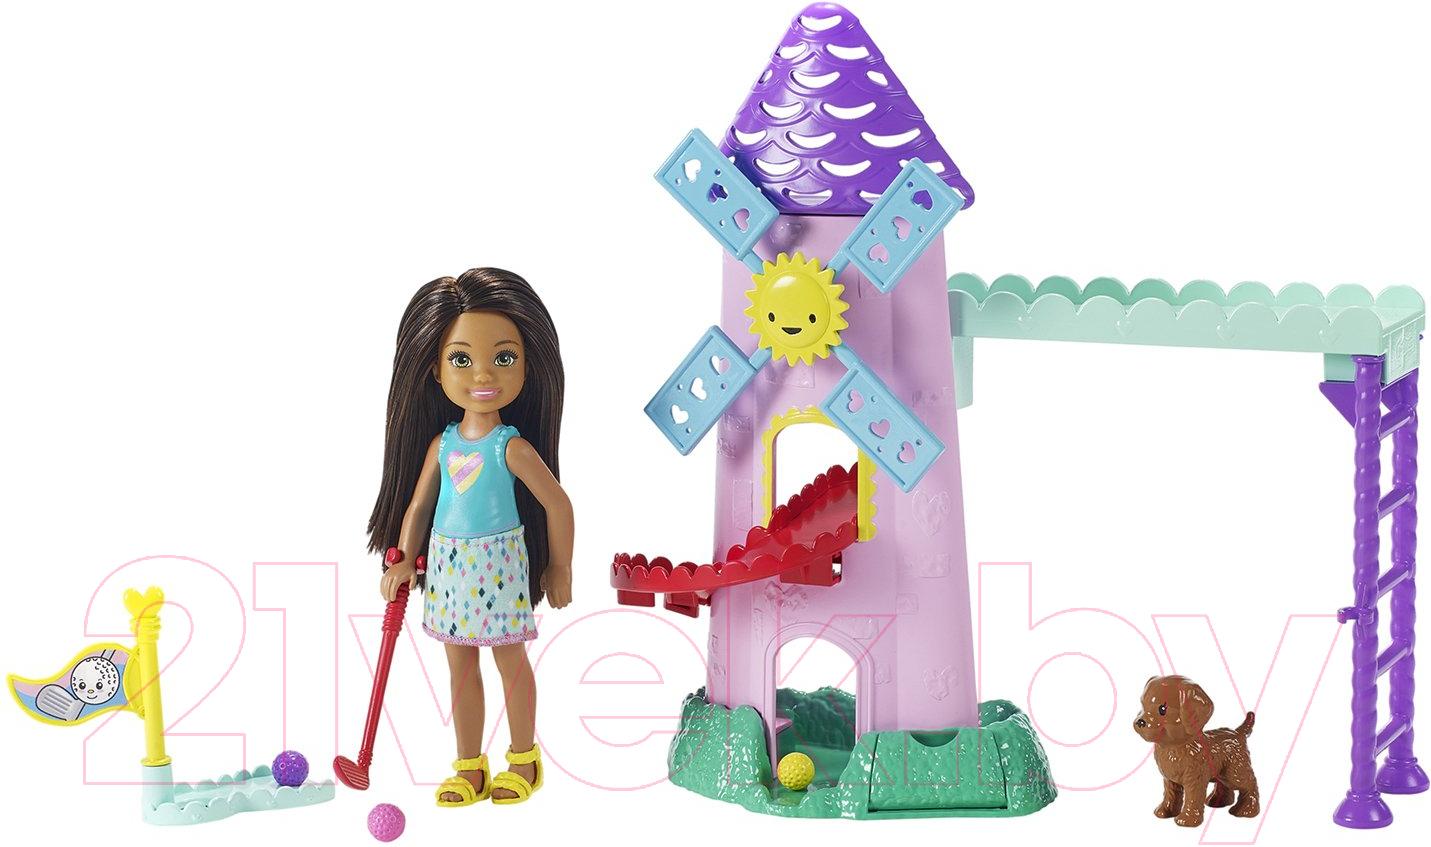 Купить Кукла с аксессуарами Barbie, Челси и зверушка / FDB32/FRL85, Китай, пластик